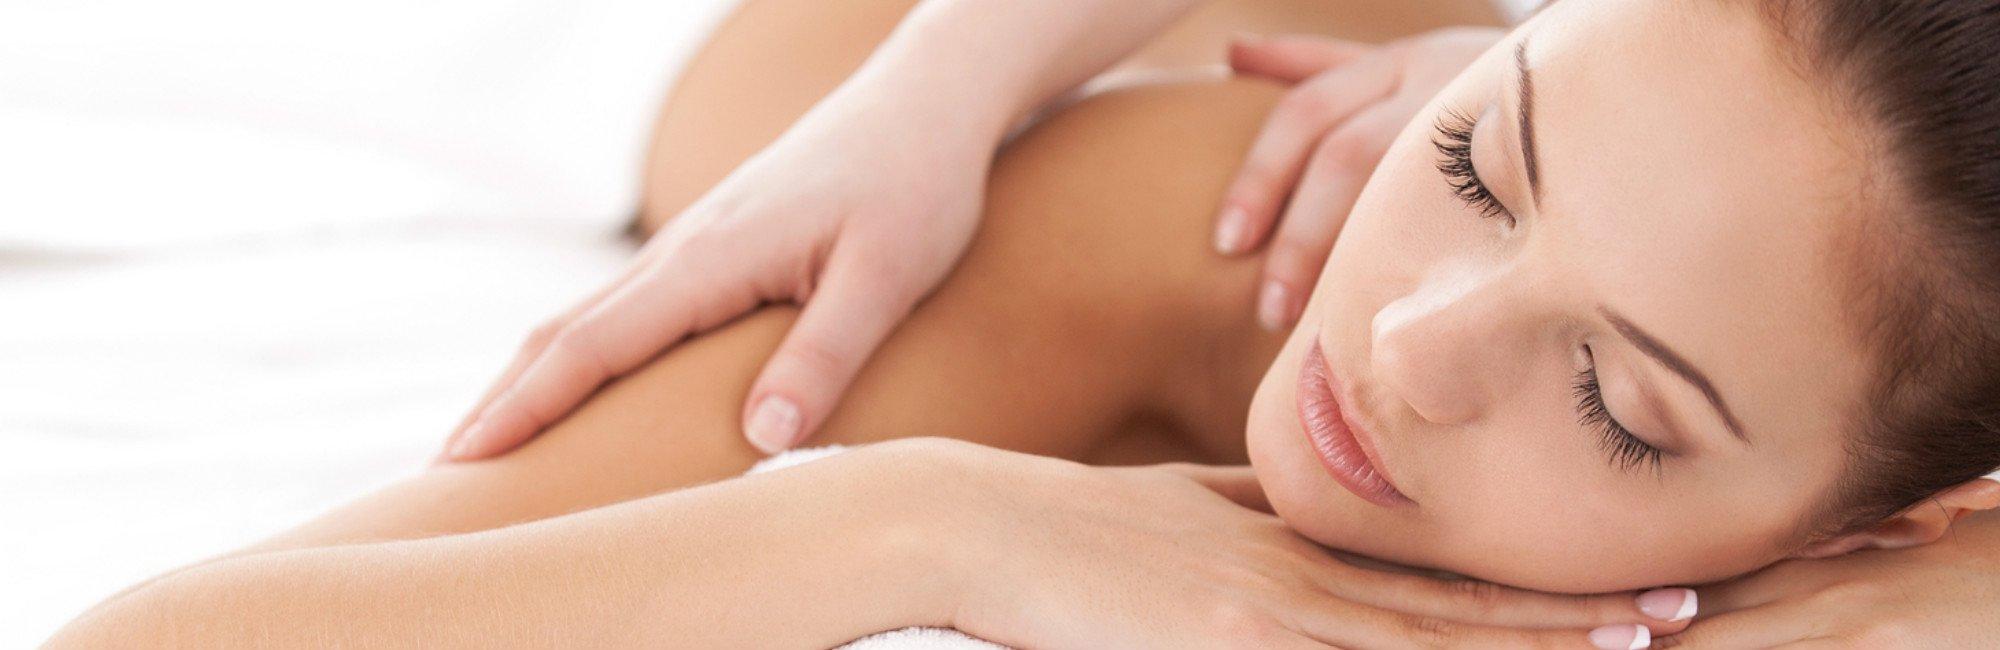 Crantock Bay Spa Massage - Spa Treatments